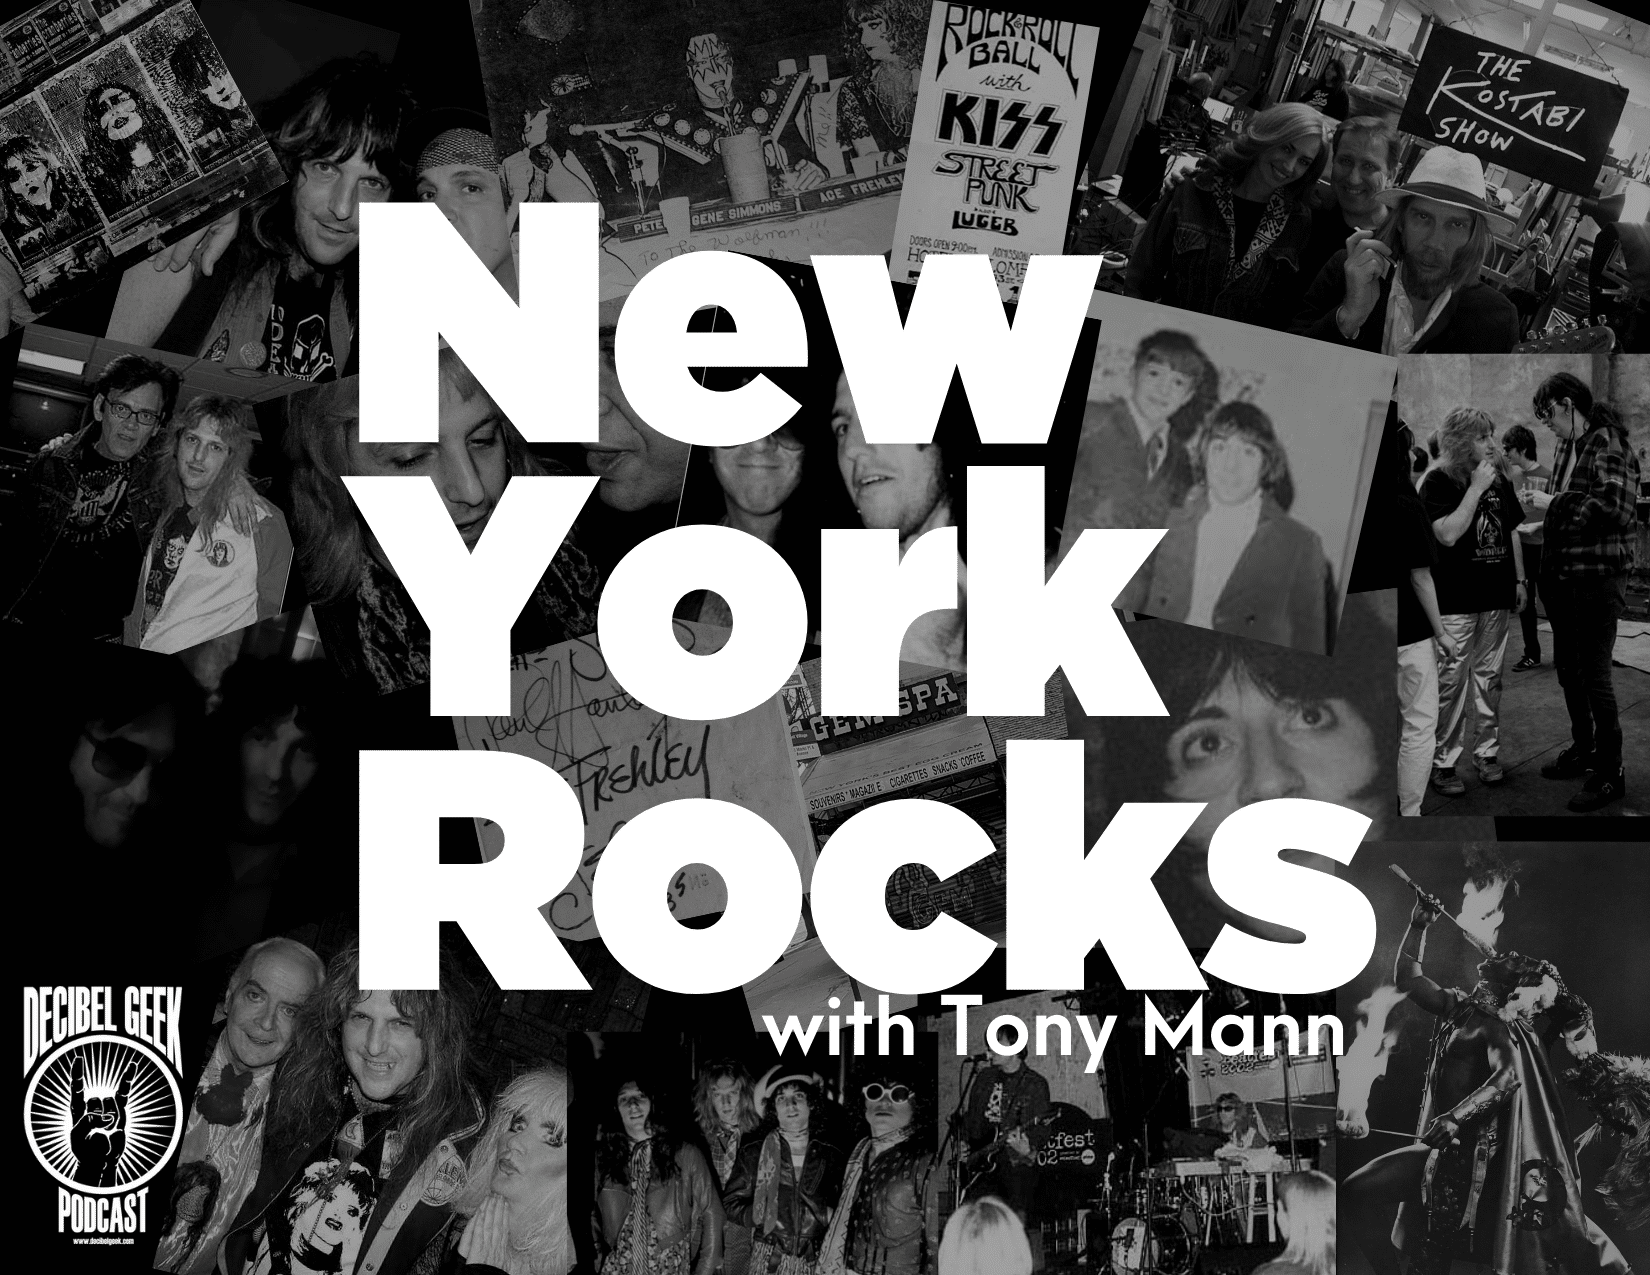 New York Rocks, Tony Mann, KISS, Ramones, Bowie, New York Dolls, rock,